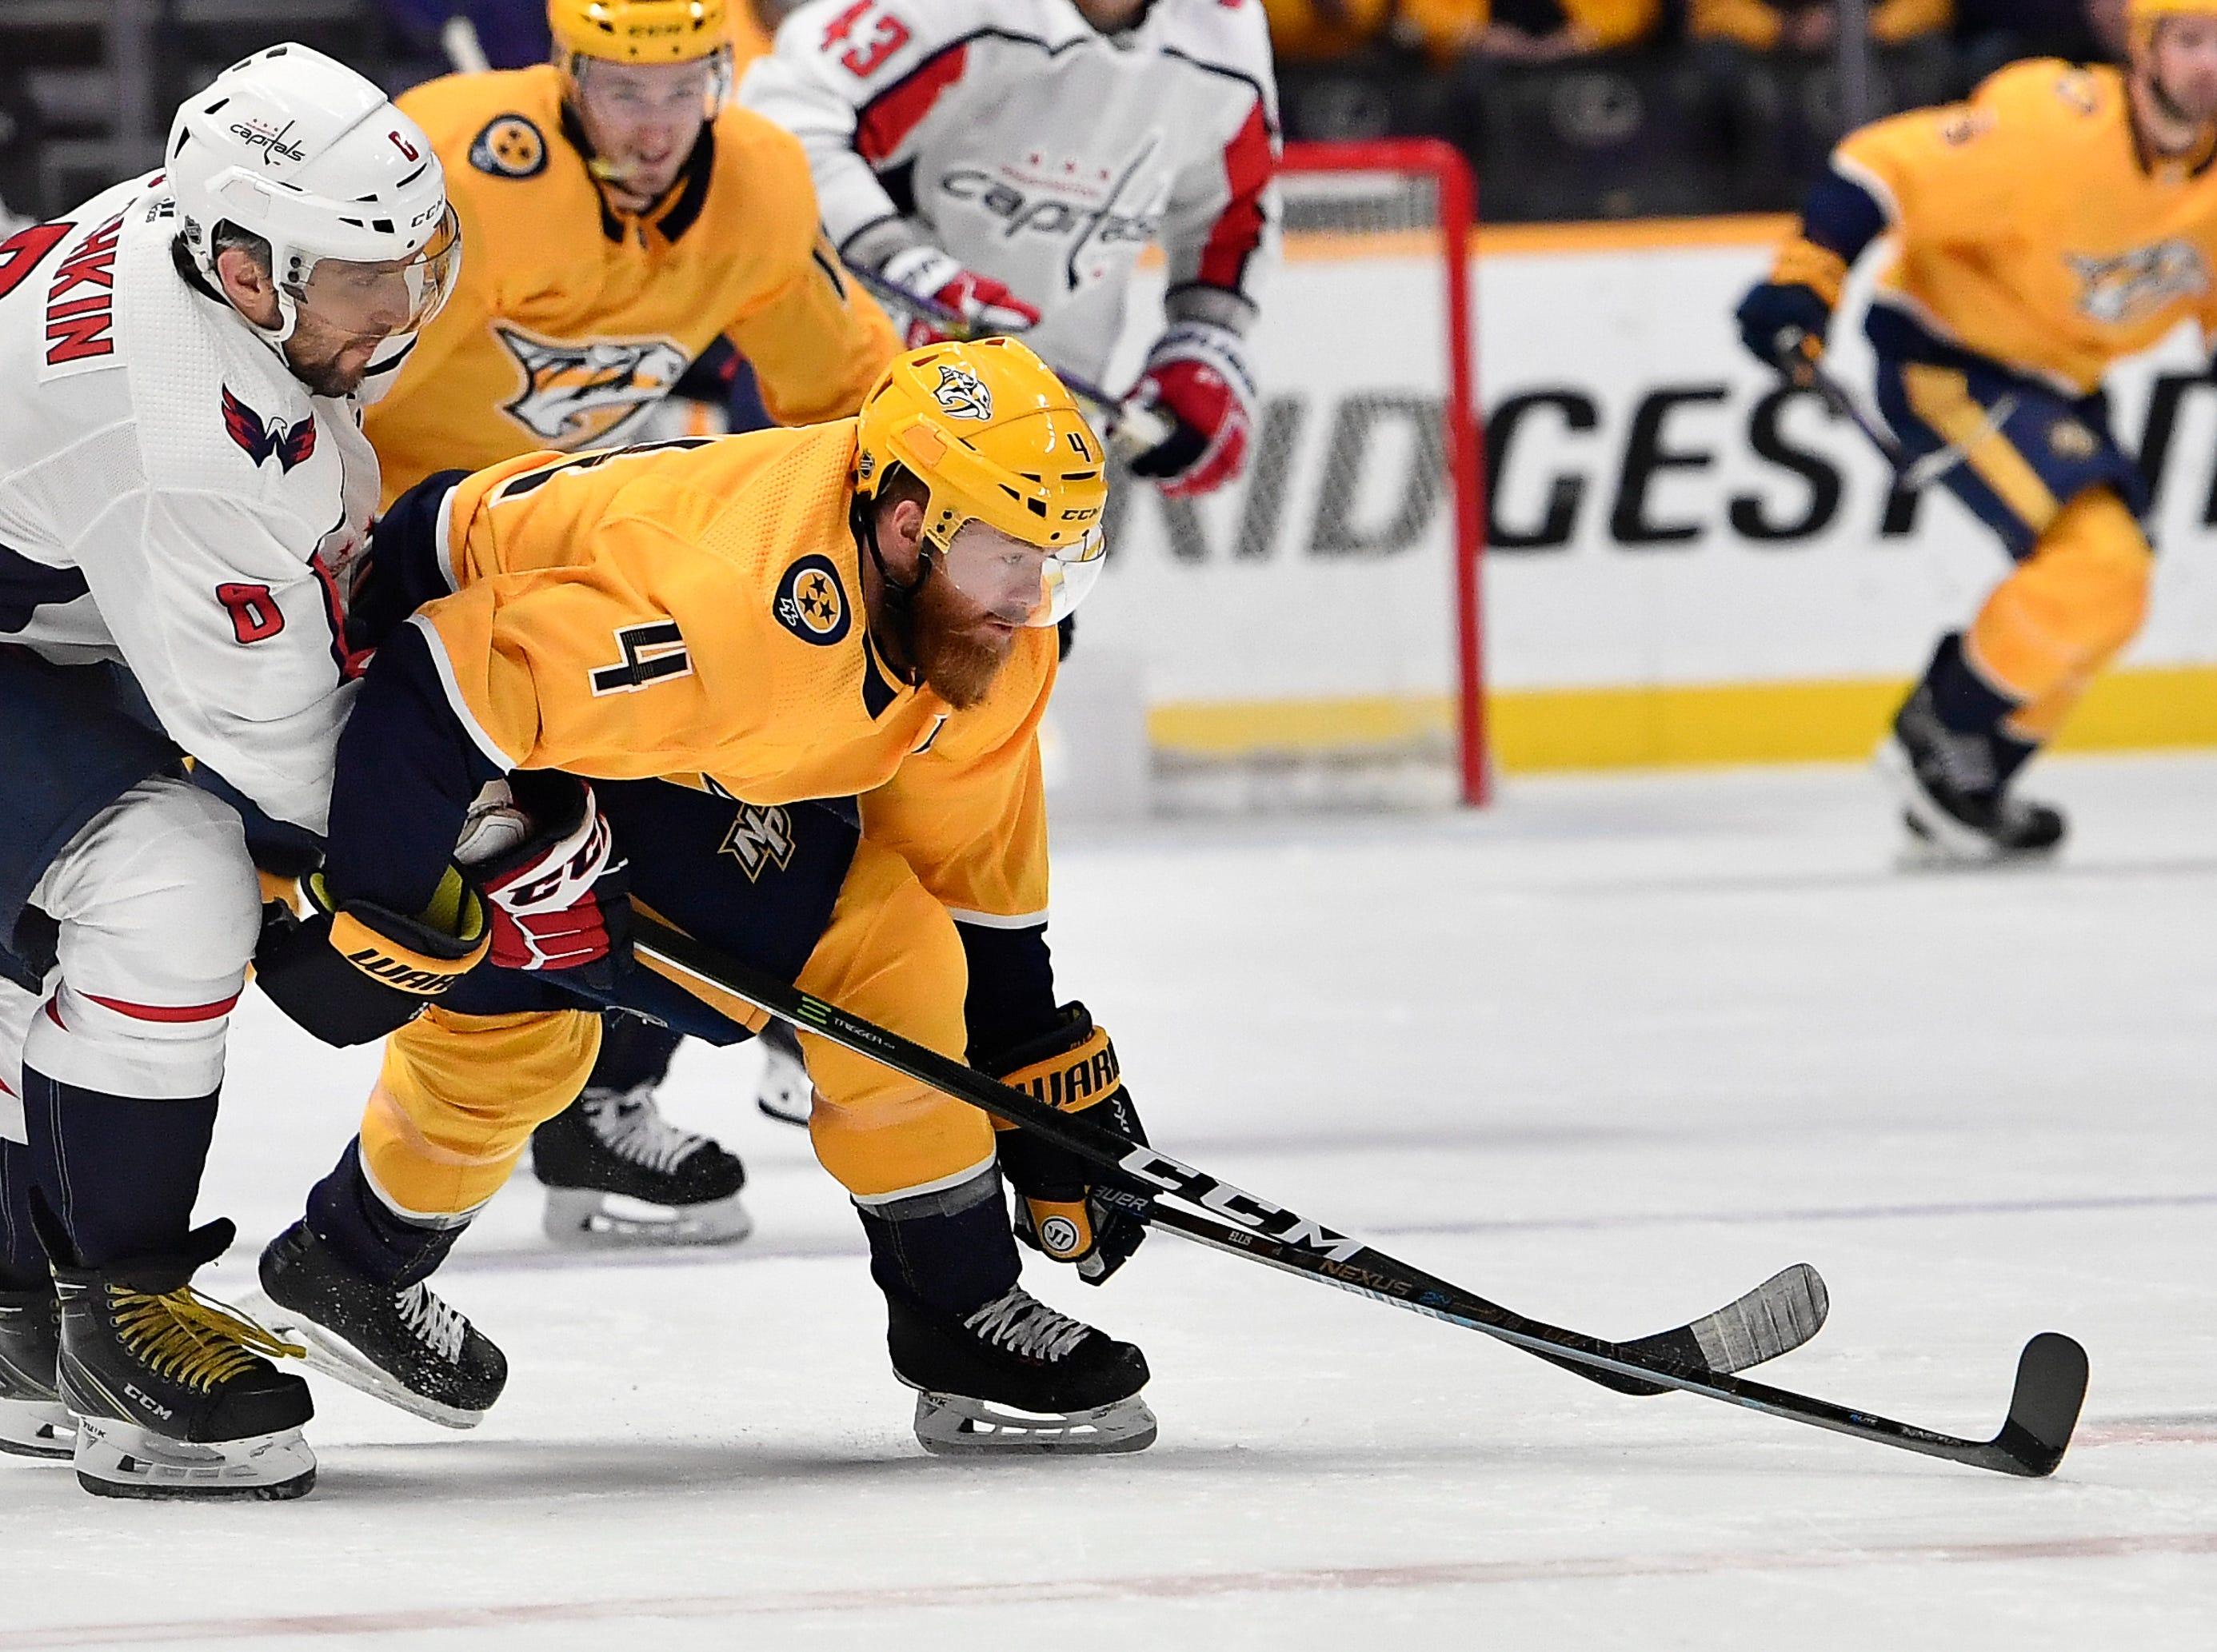 Predators defenseman Ryan Ellis (4) takes the puck from Capitals left wing Alex Ovechkin (8) during the first period at Bridgestone Arena Tuesday, Jan. 15, 2019, in Nashville, Tenn.